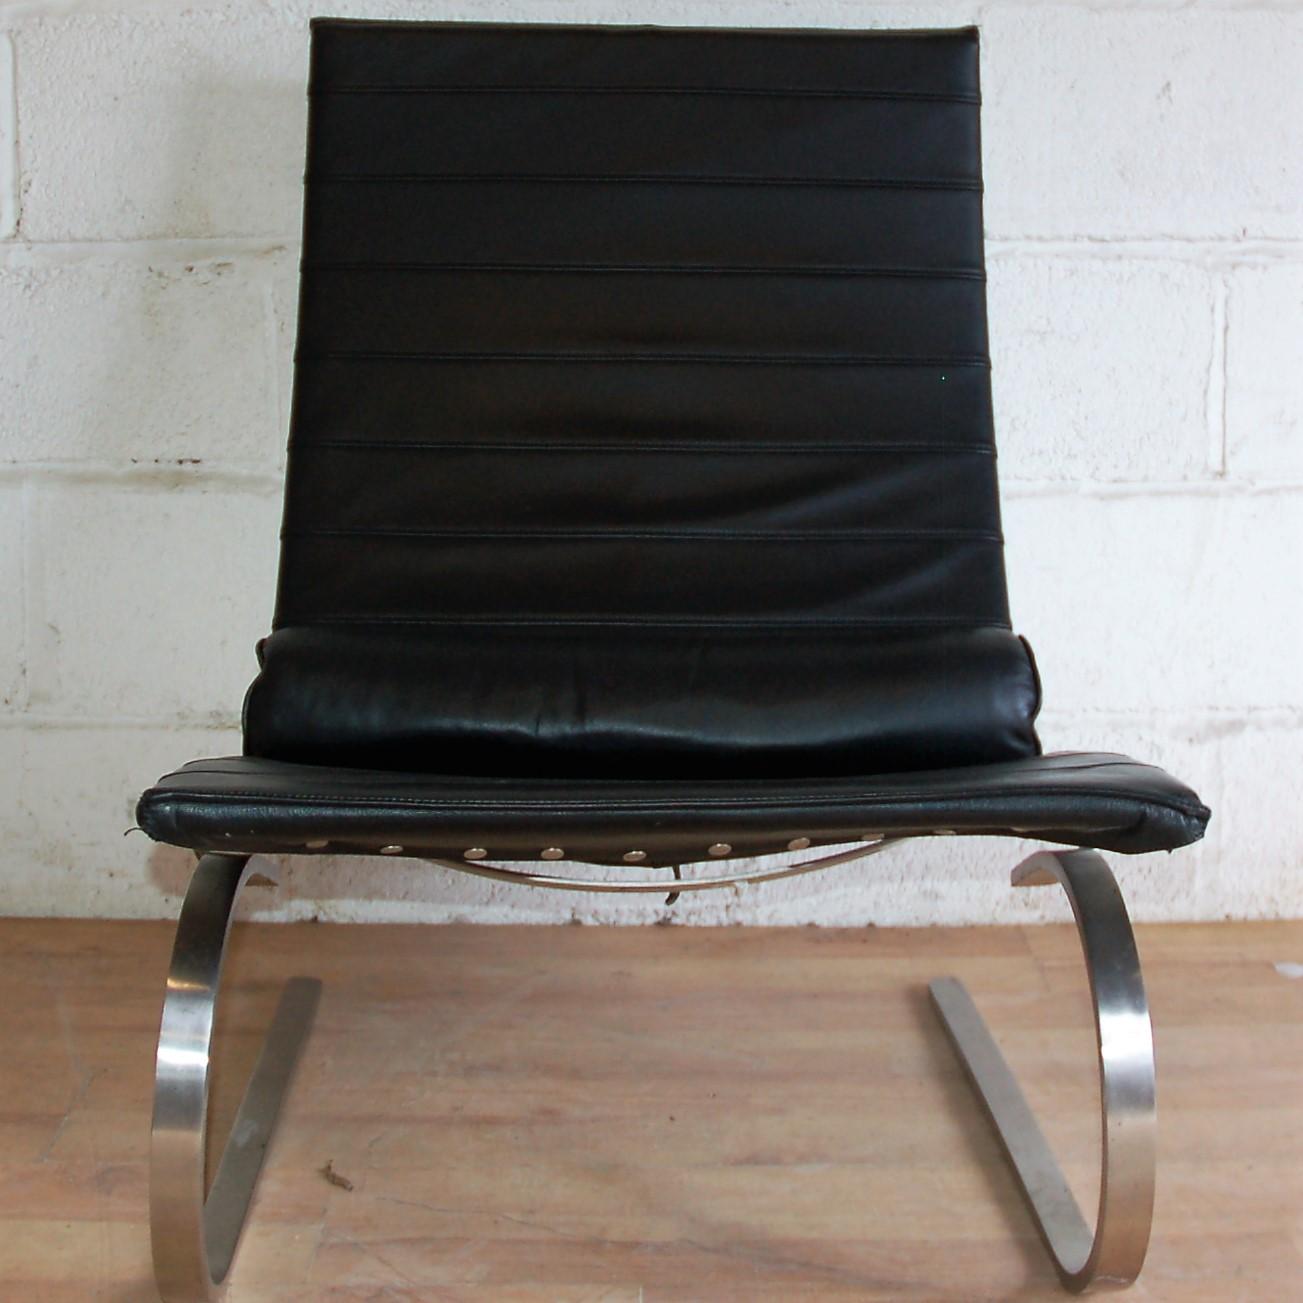 Pk20 rocking chair poul kjaerholm replica 3008 allard for Danish design furniture replica uk